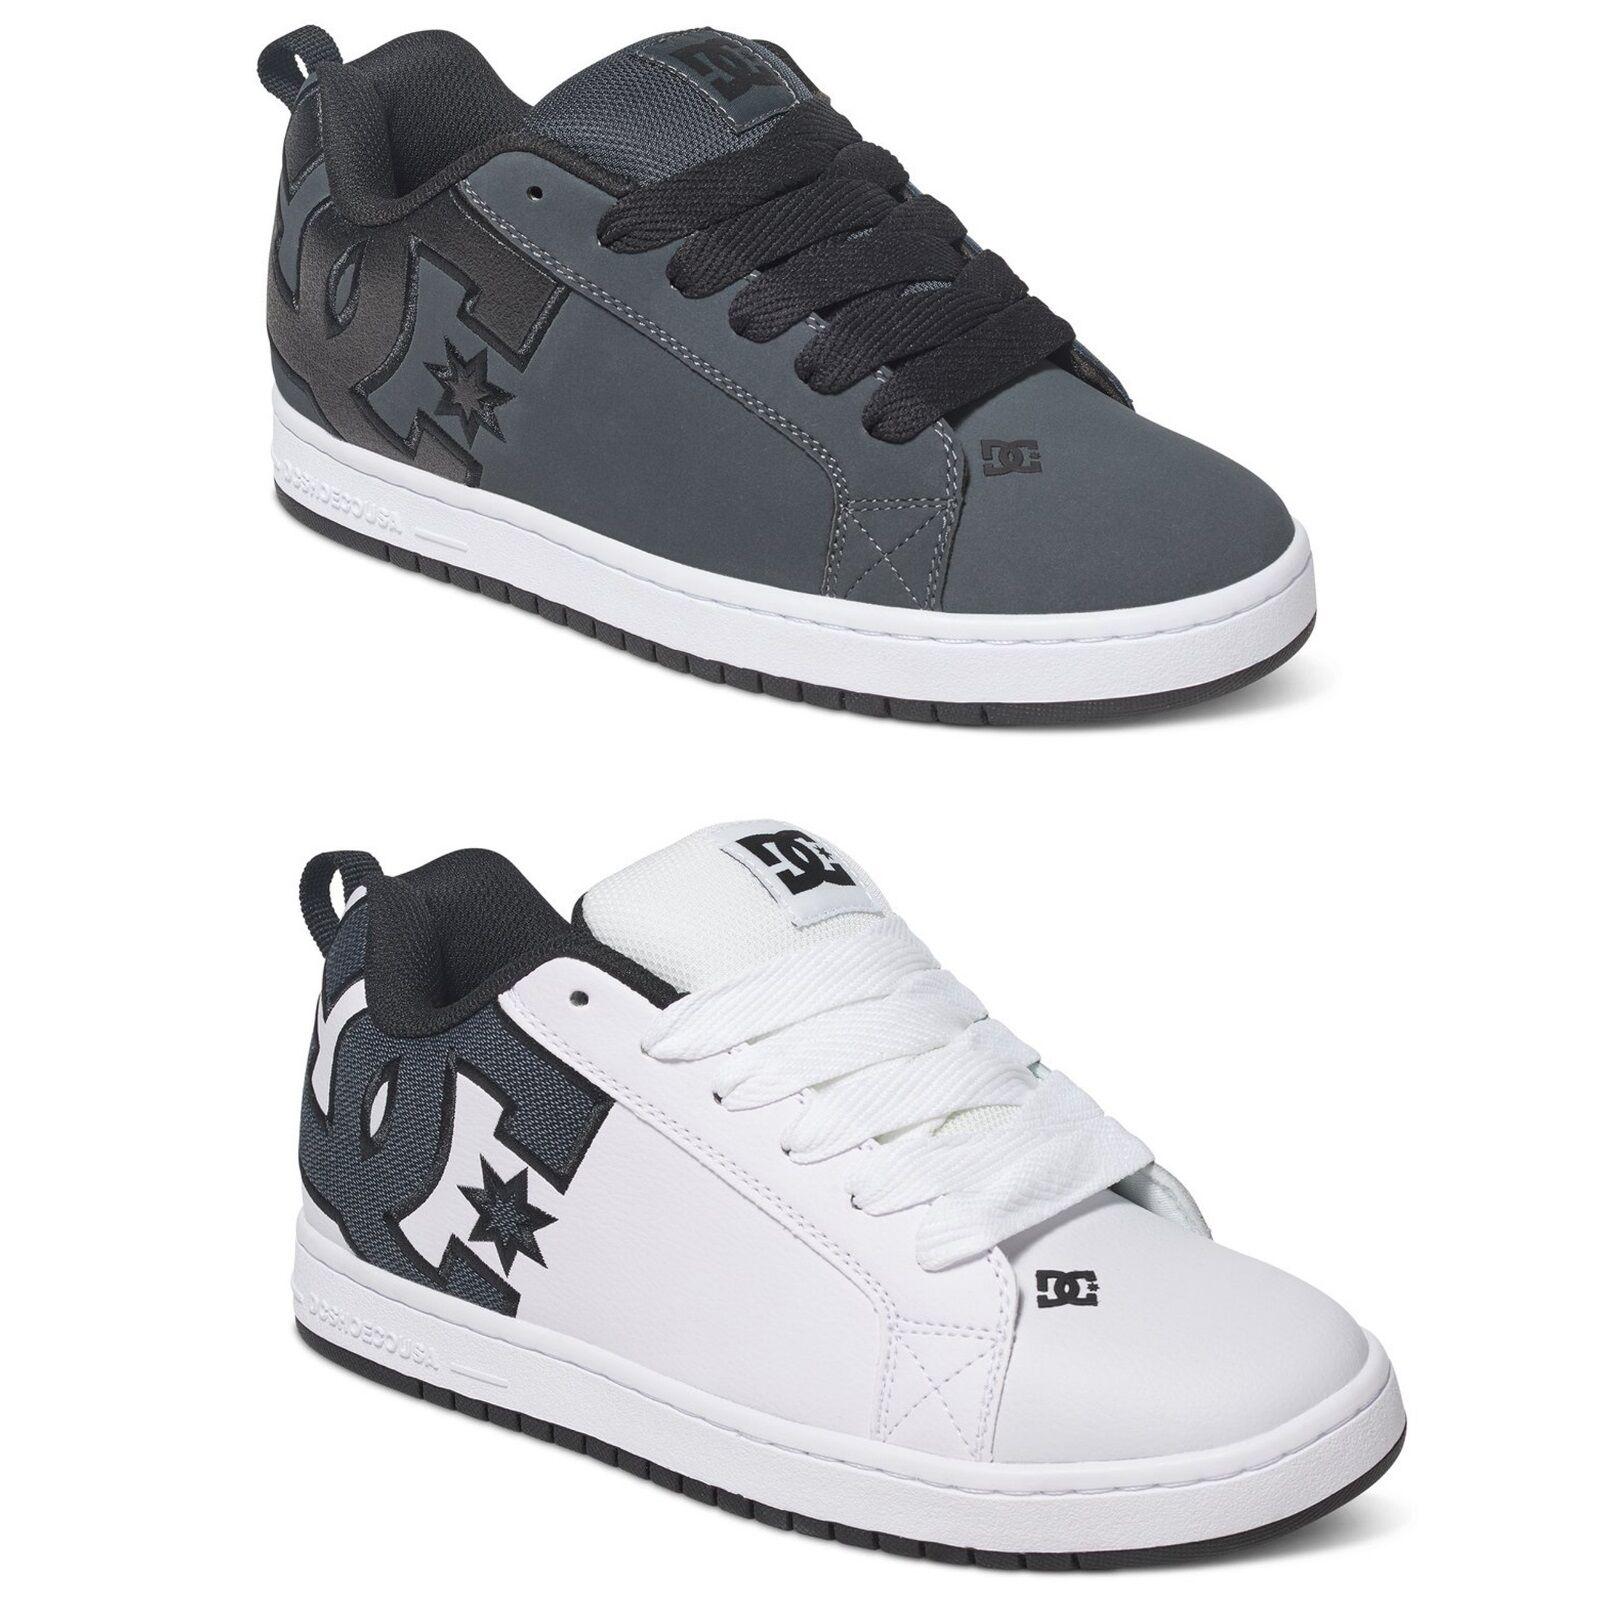 DC - Court Graffik Low SE 300927 mehrere Farben Low Graffik Top Zapatos Skateschuh Sneaker 770efe